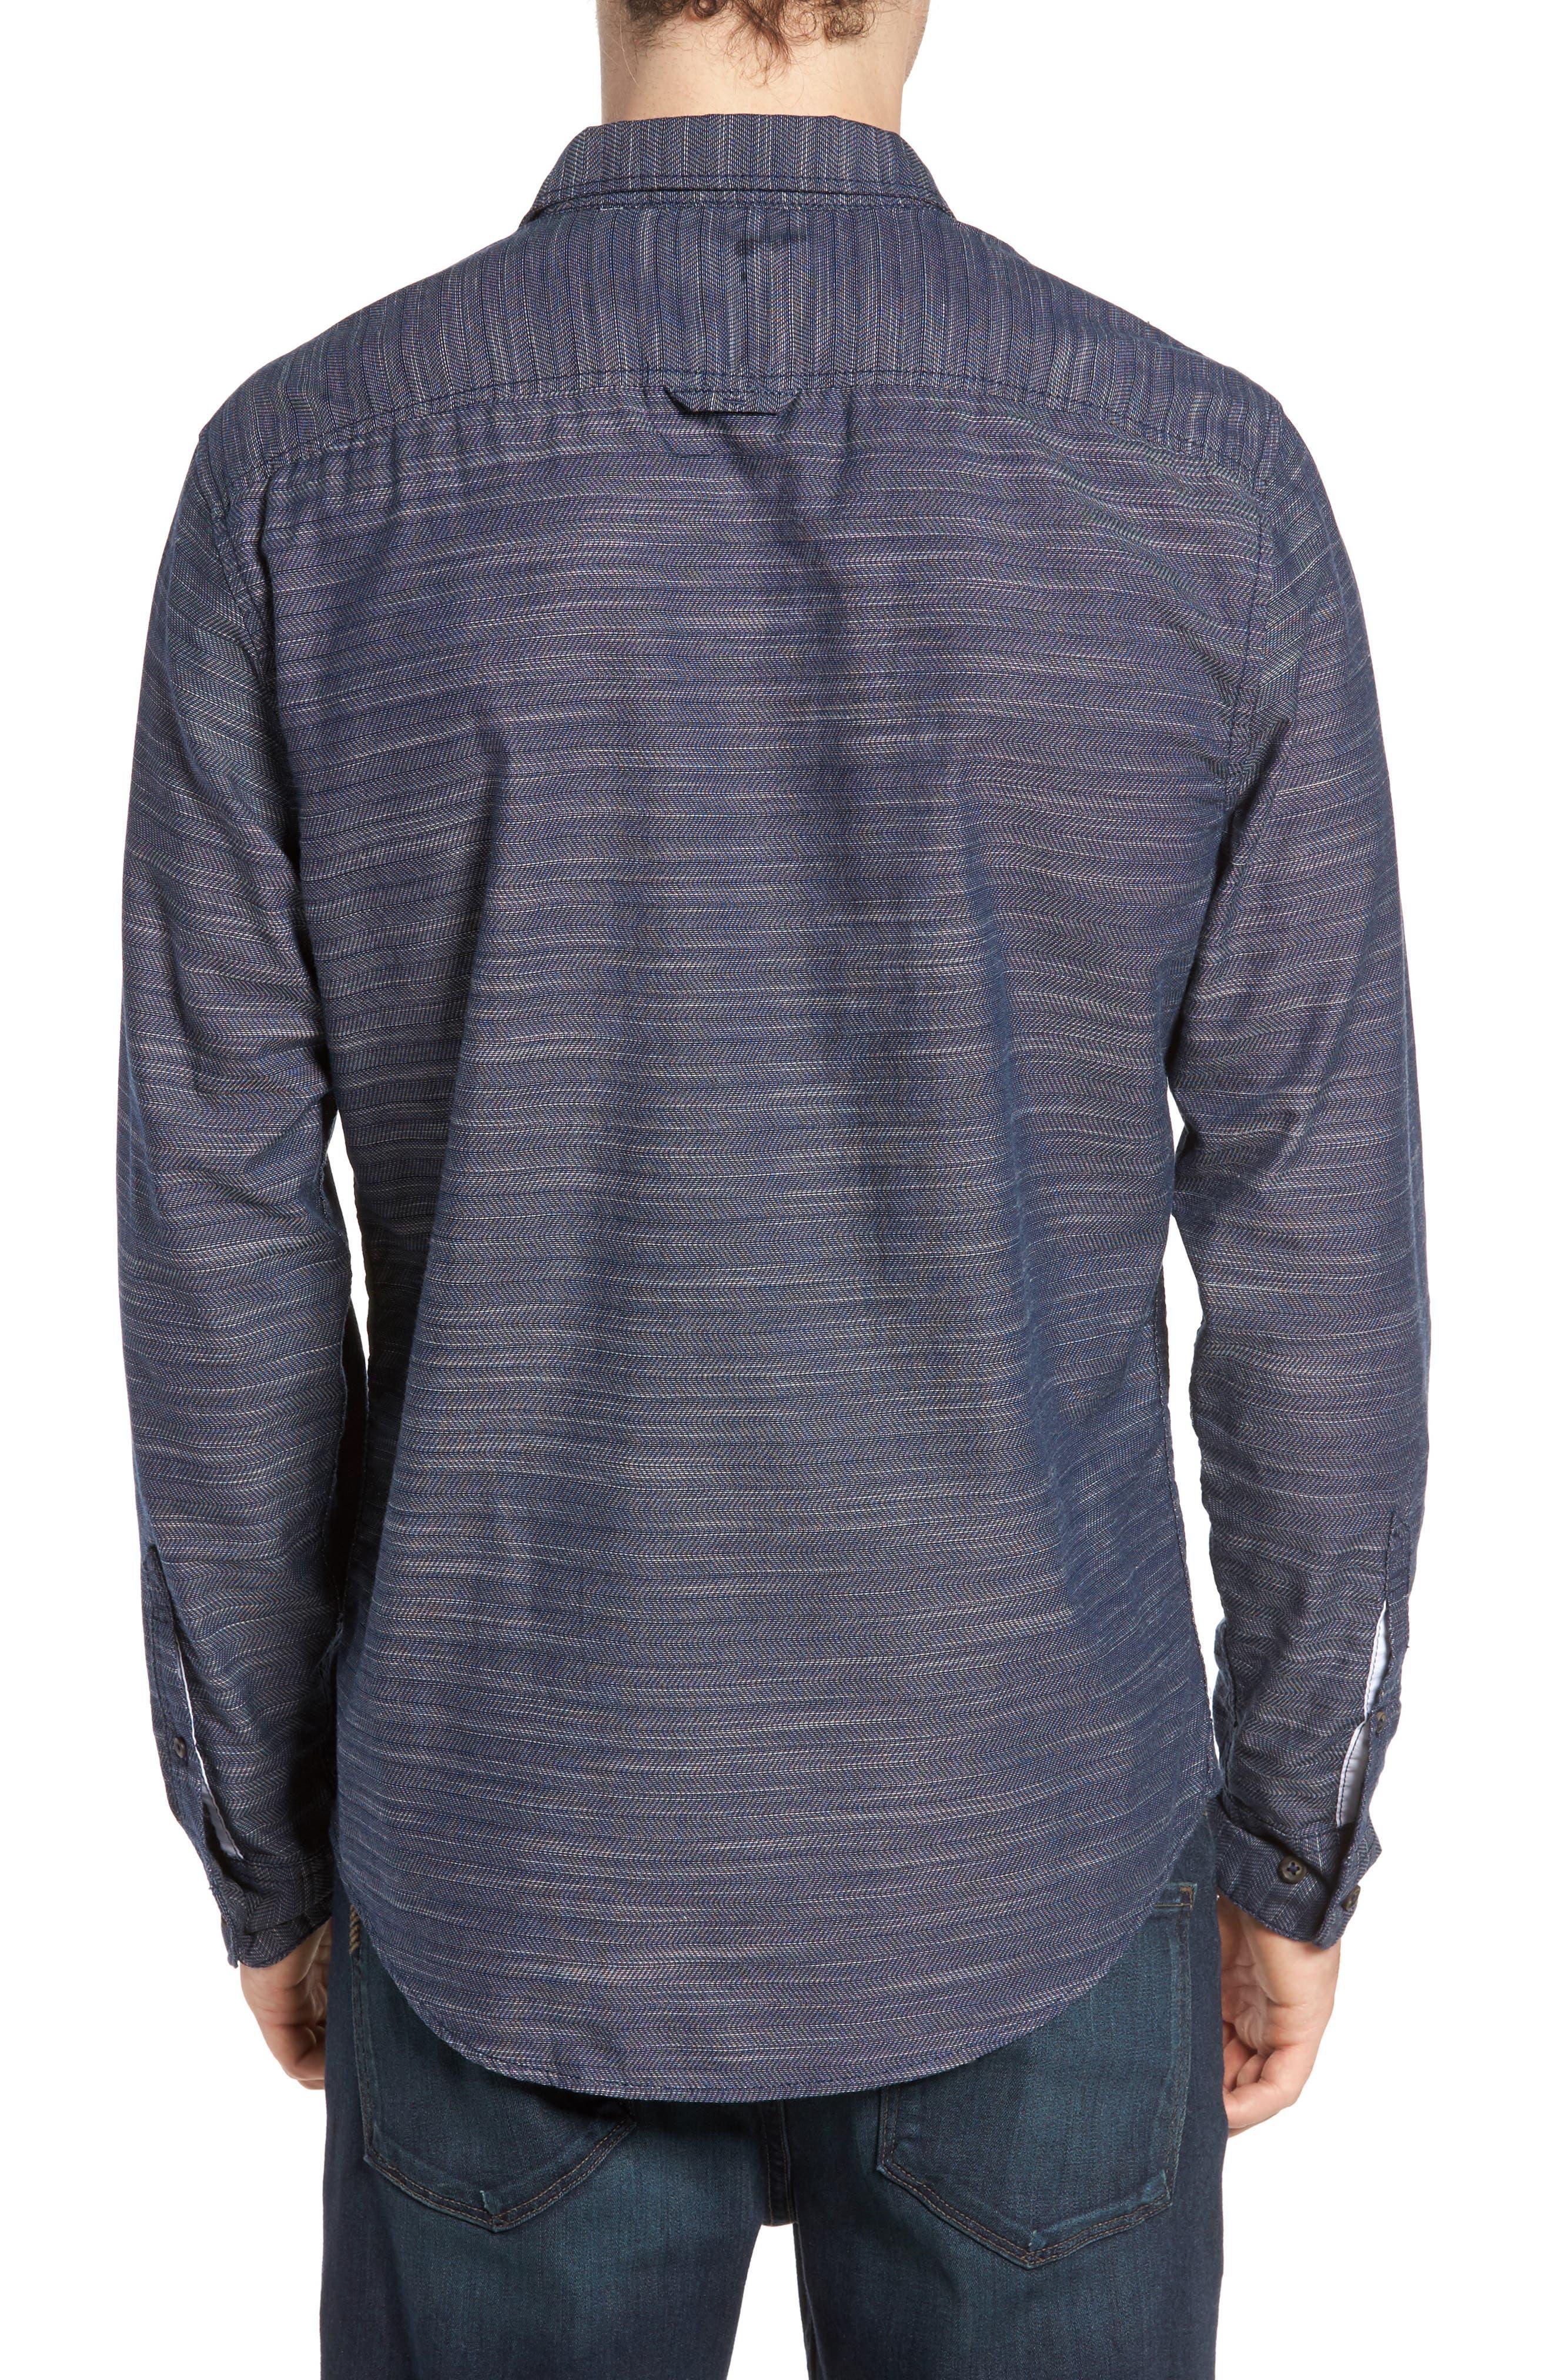 Herringbone Chambray Shirt,                             Alternate thumbnail 2, color,                             Navy Charcoal Herringbone